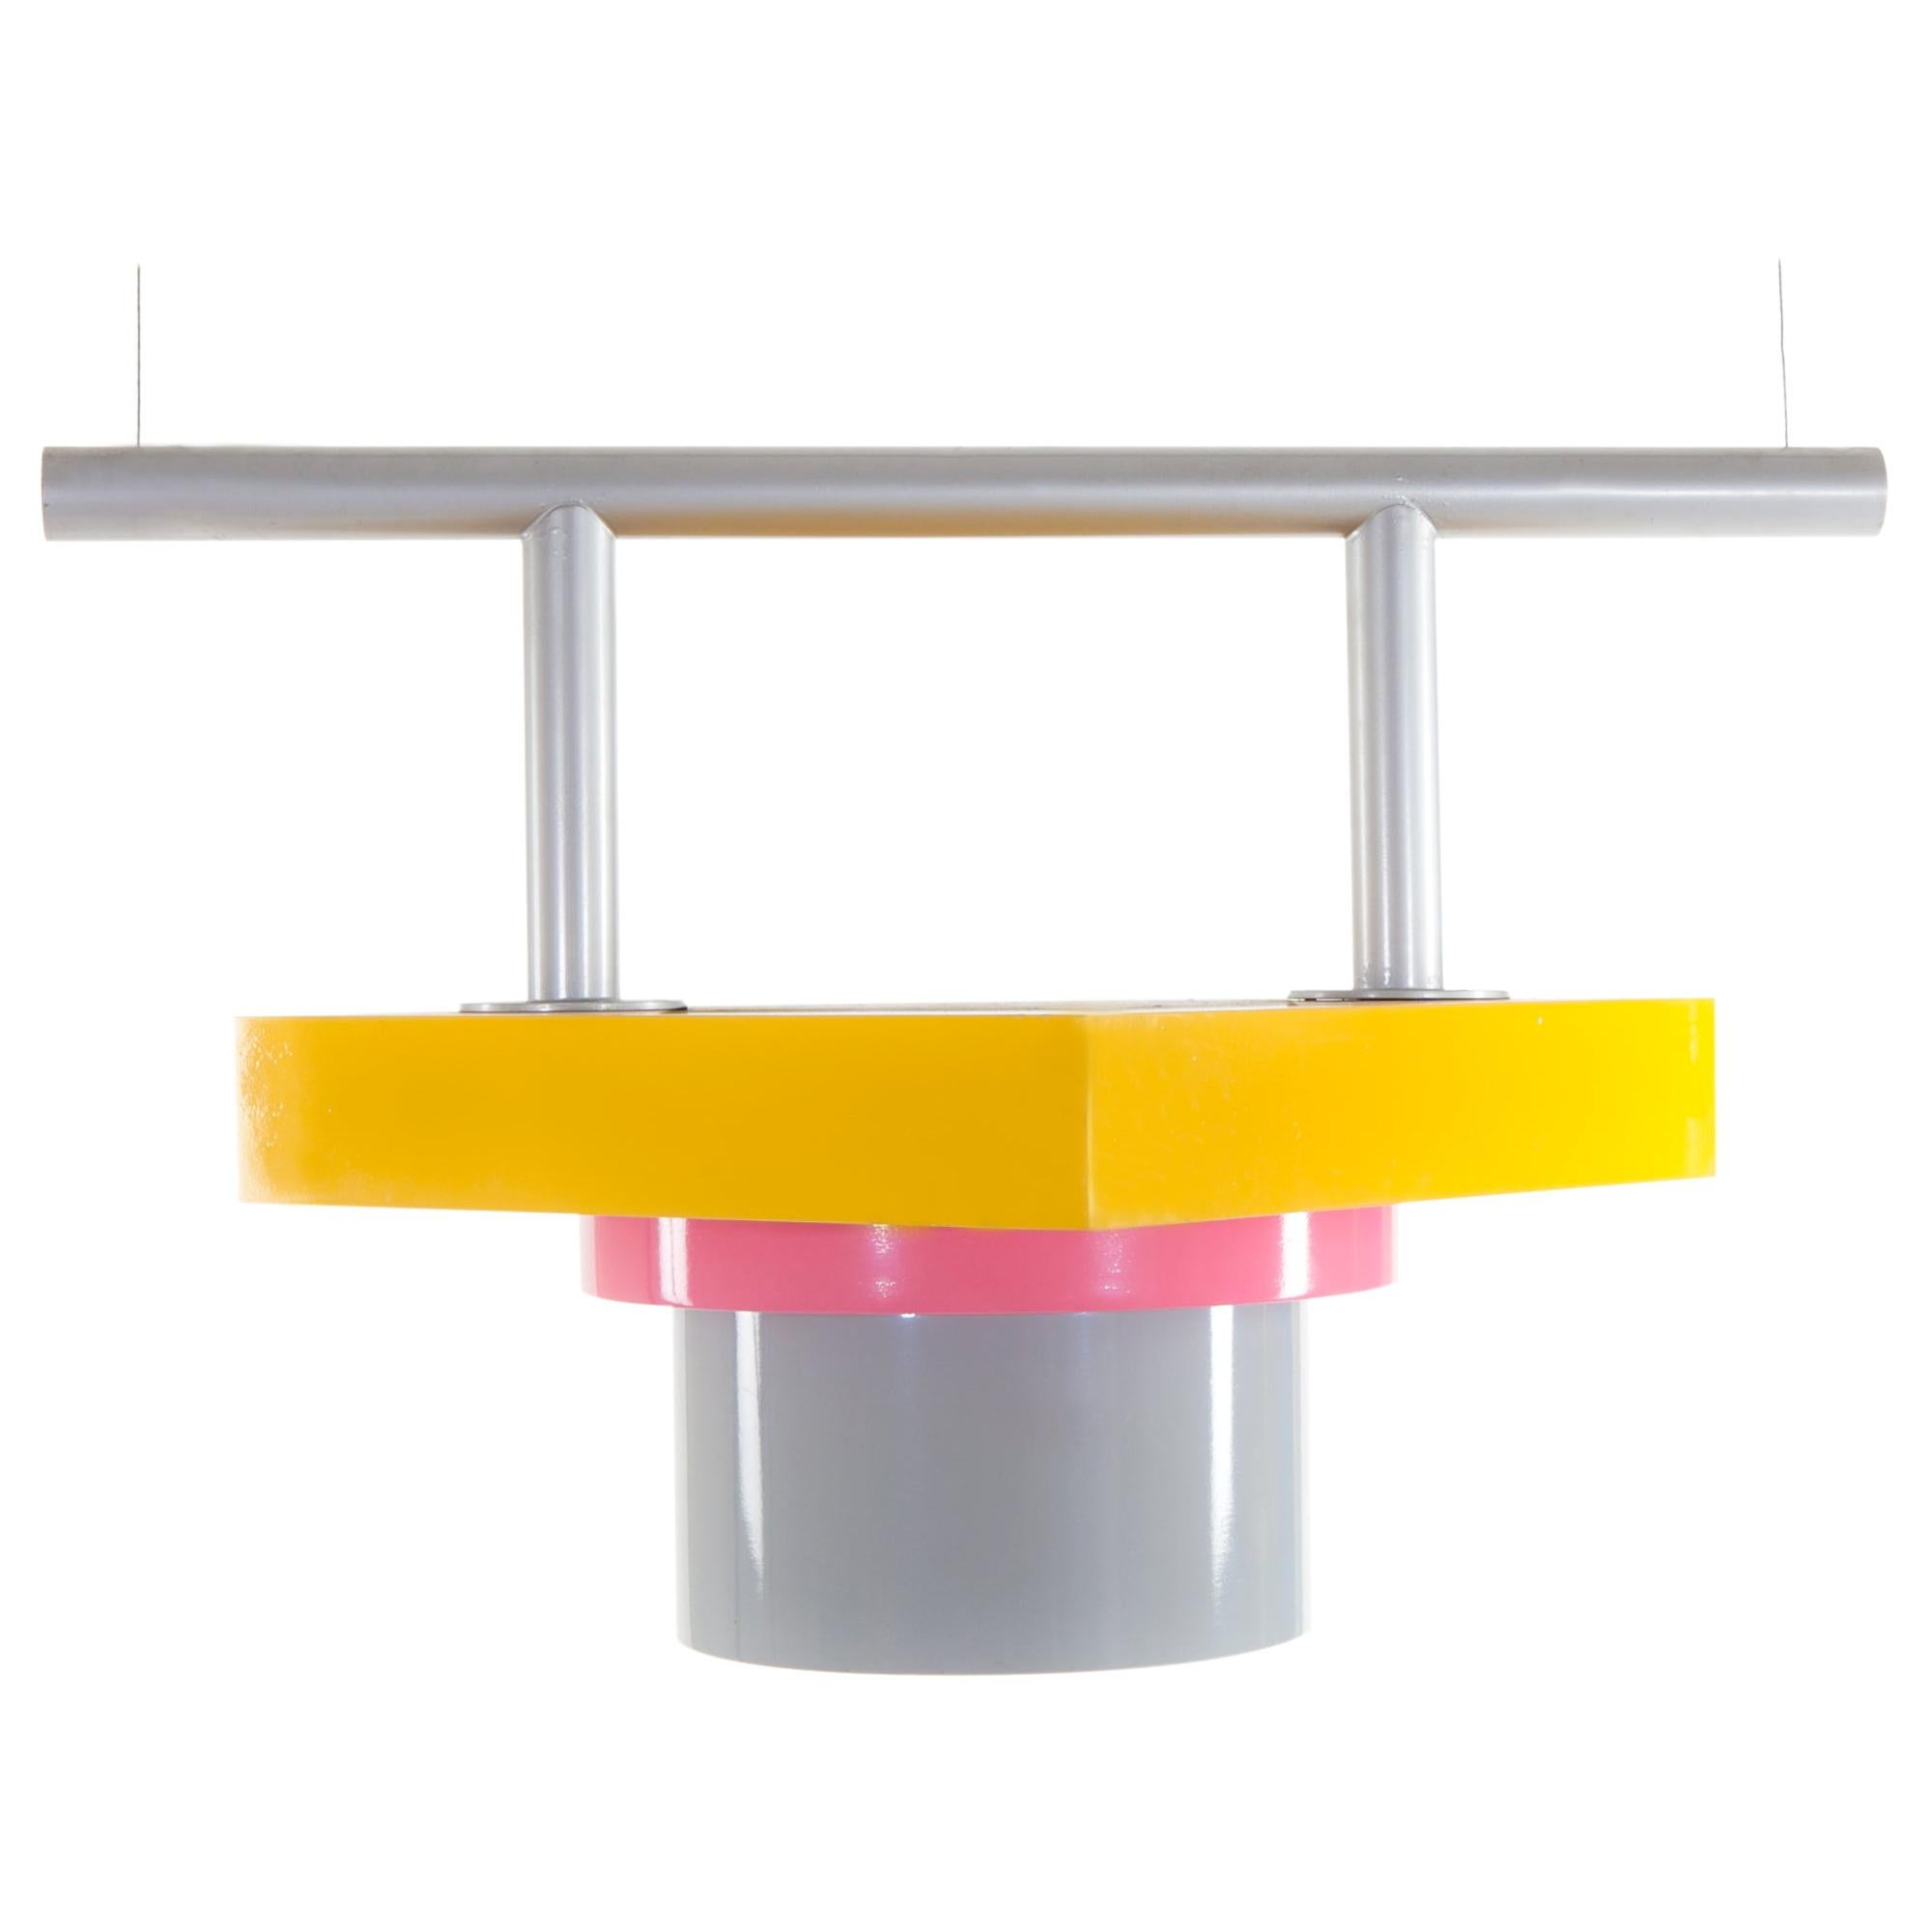 Rossella Metal Ceiling Lamp EU 220 Volts, by Marco Zanini for Memphis Milano C.